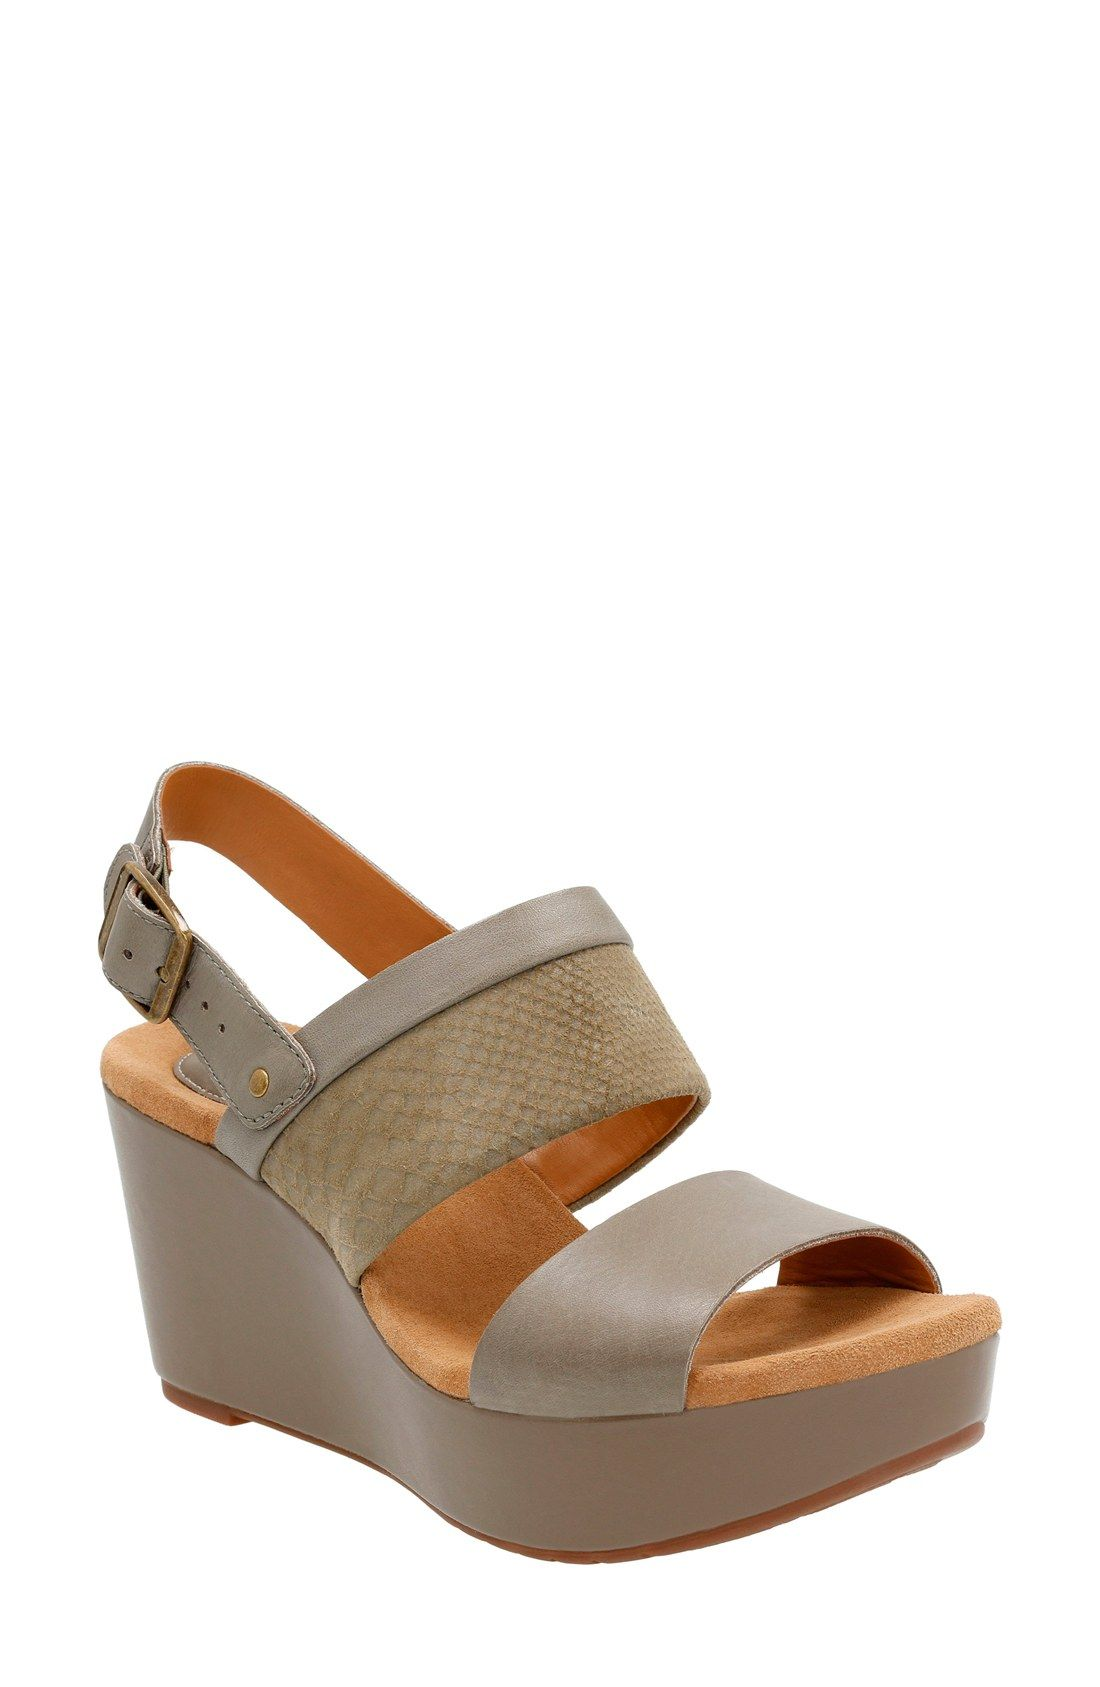 4ef03a1bb0a Clarks®  Caslynn Kat  Wedge Sandal (Women)